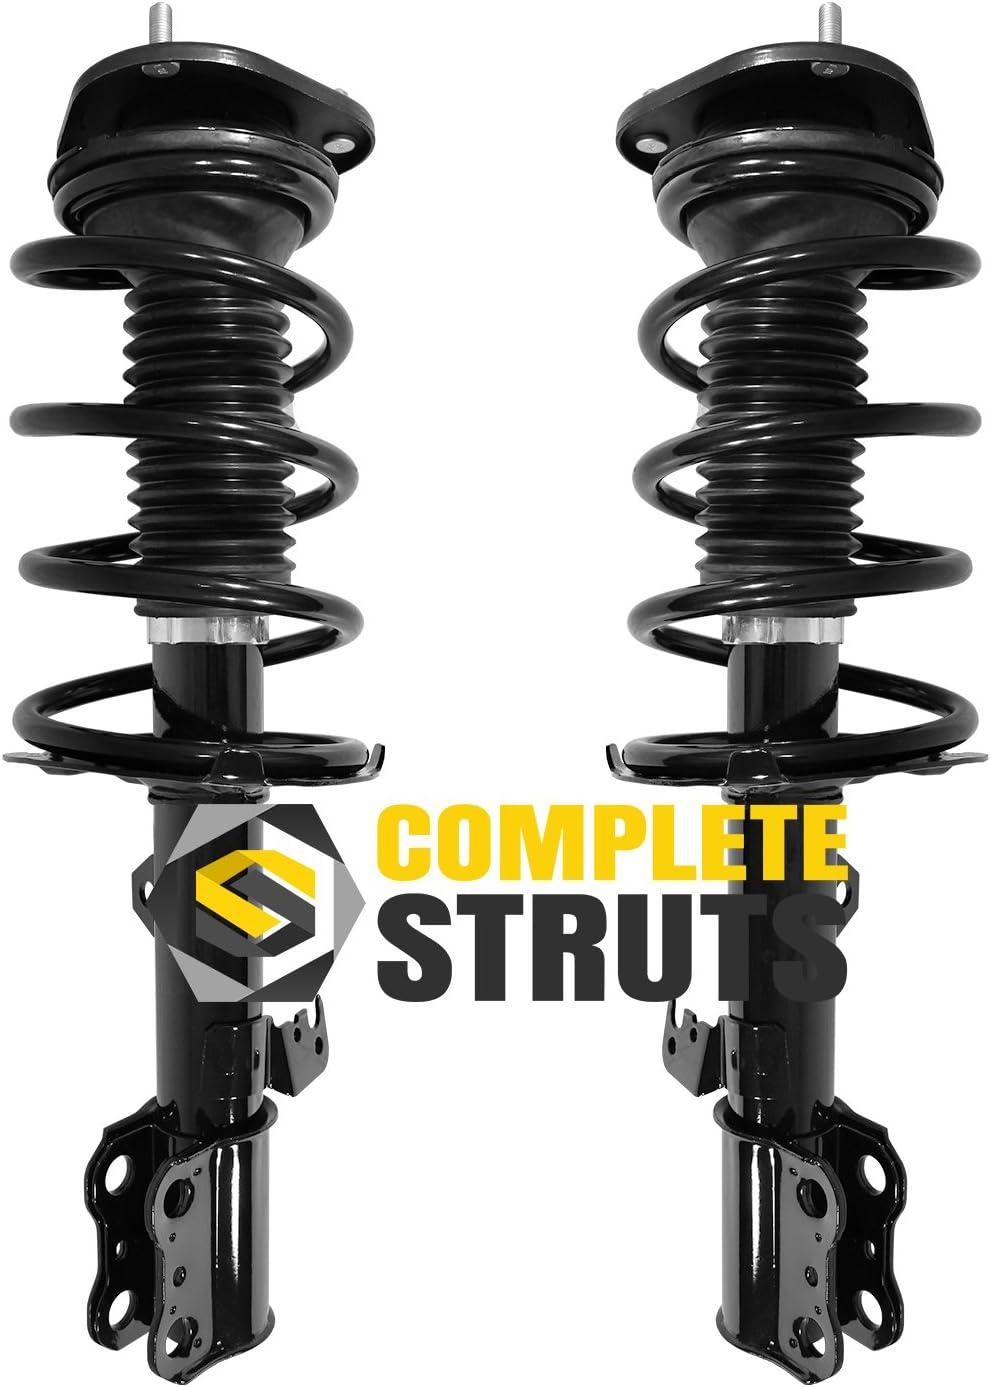 Front Quick Complete Struts /& Coil Spring Assemblies Compatible with 2005-2010 Scion tC Pair